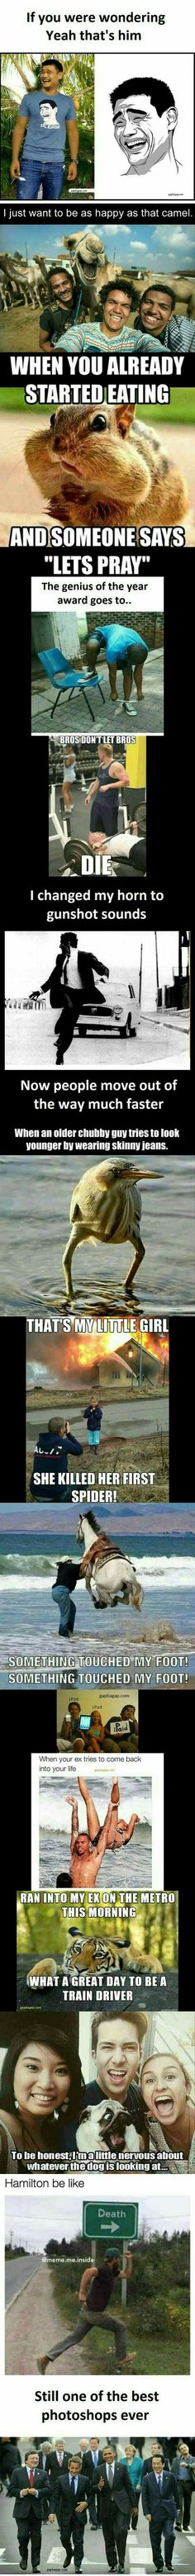 Top 15 Funny Memes